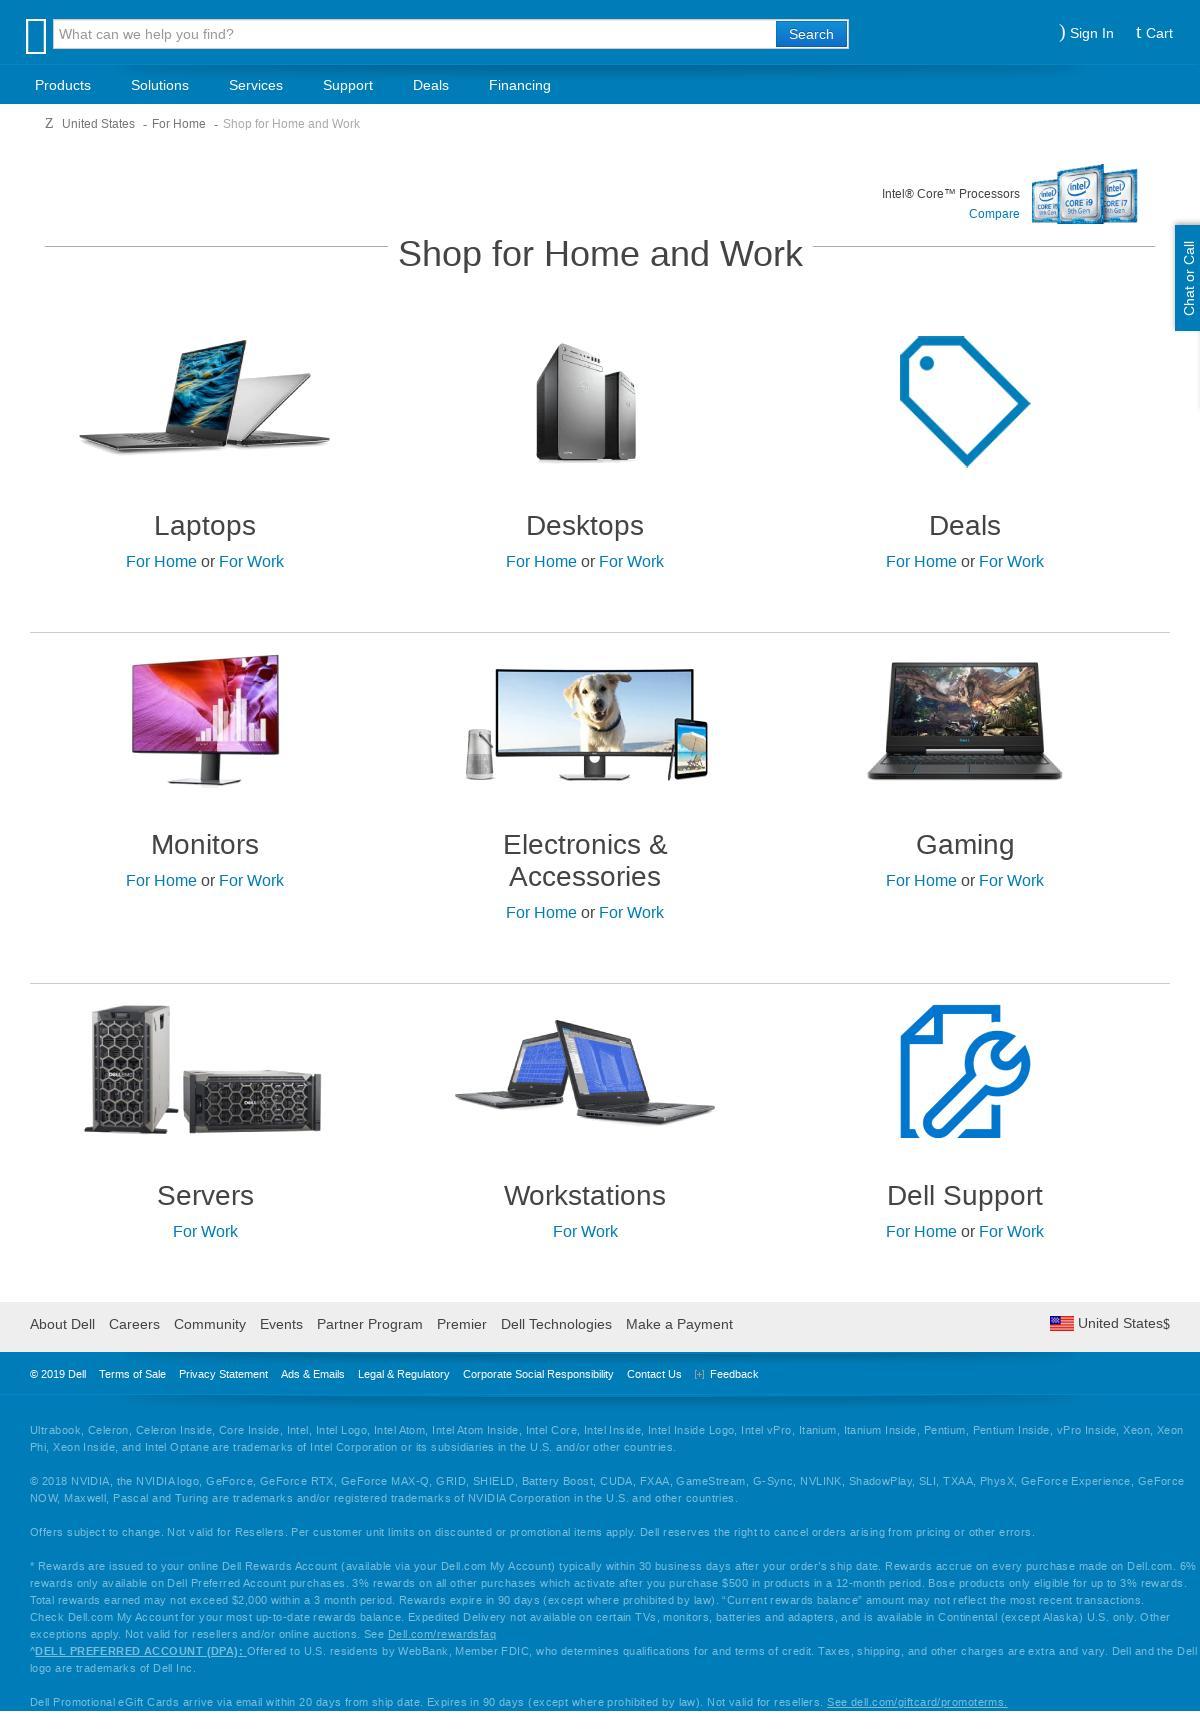 dell com Landing Page Design for Laptops & Tablets / Laptops